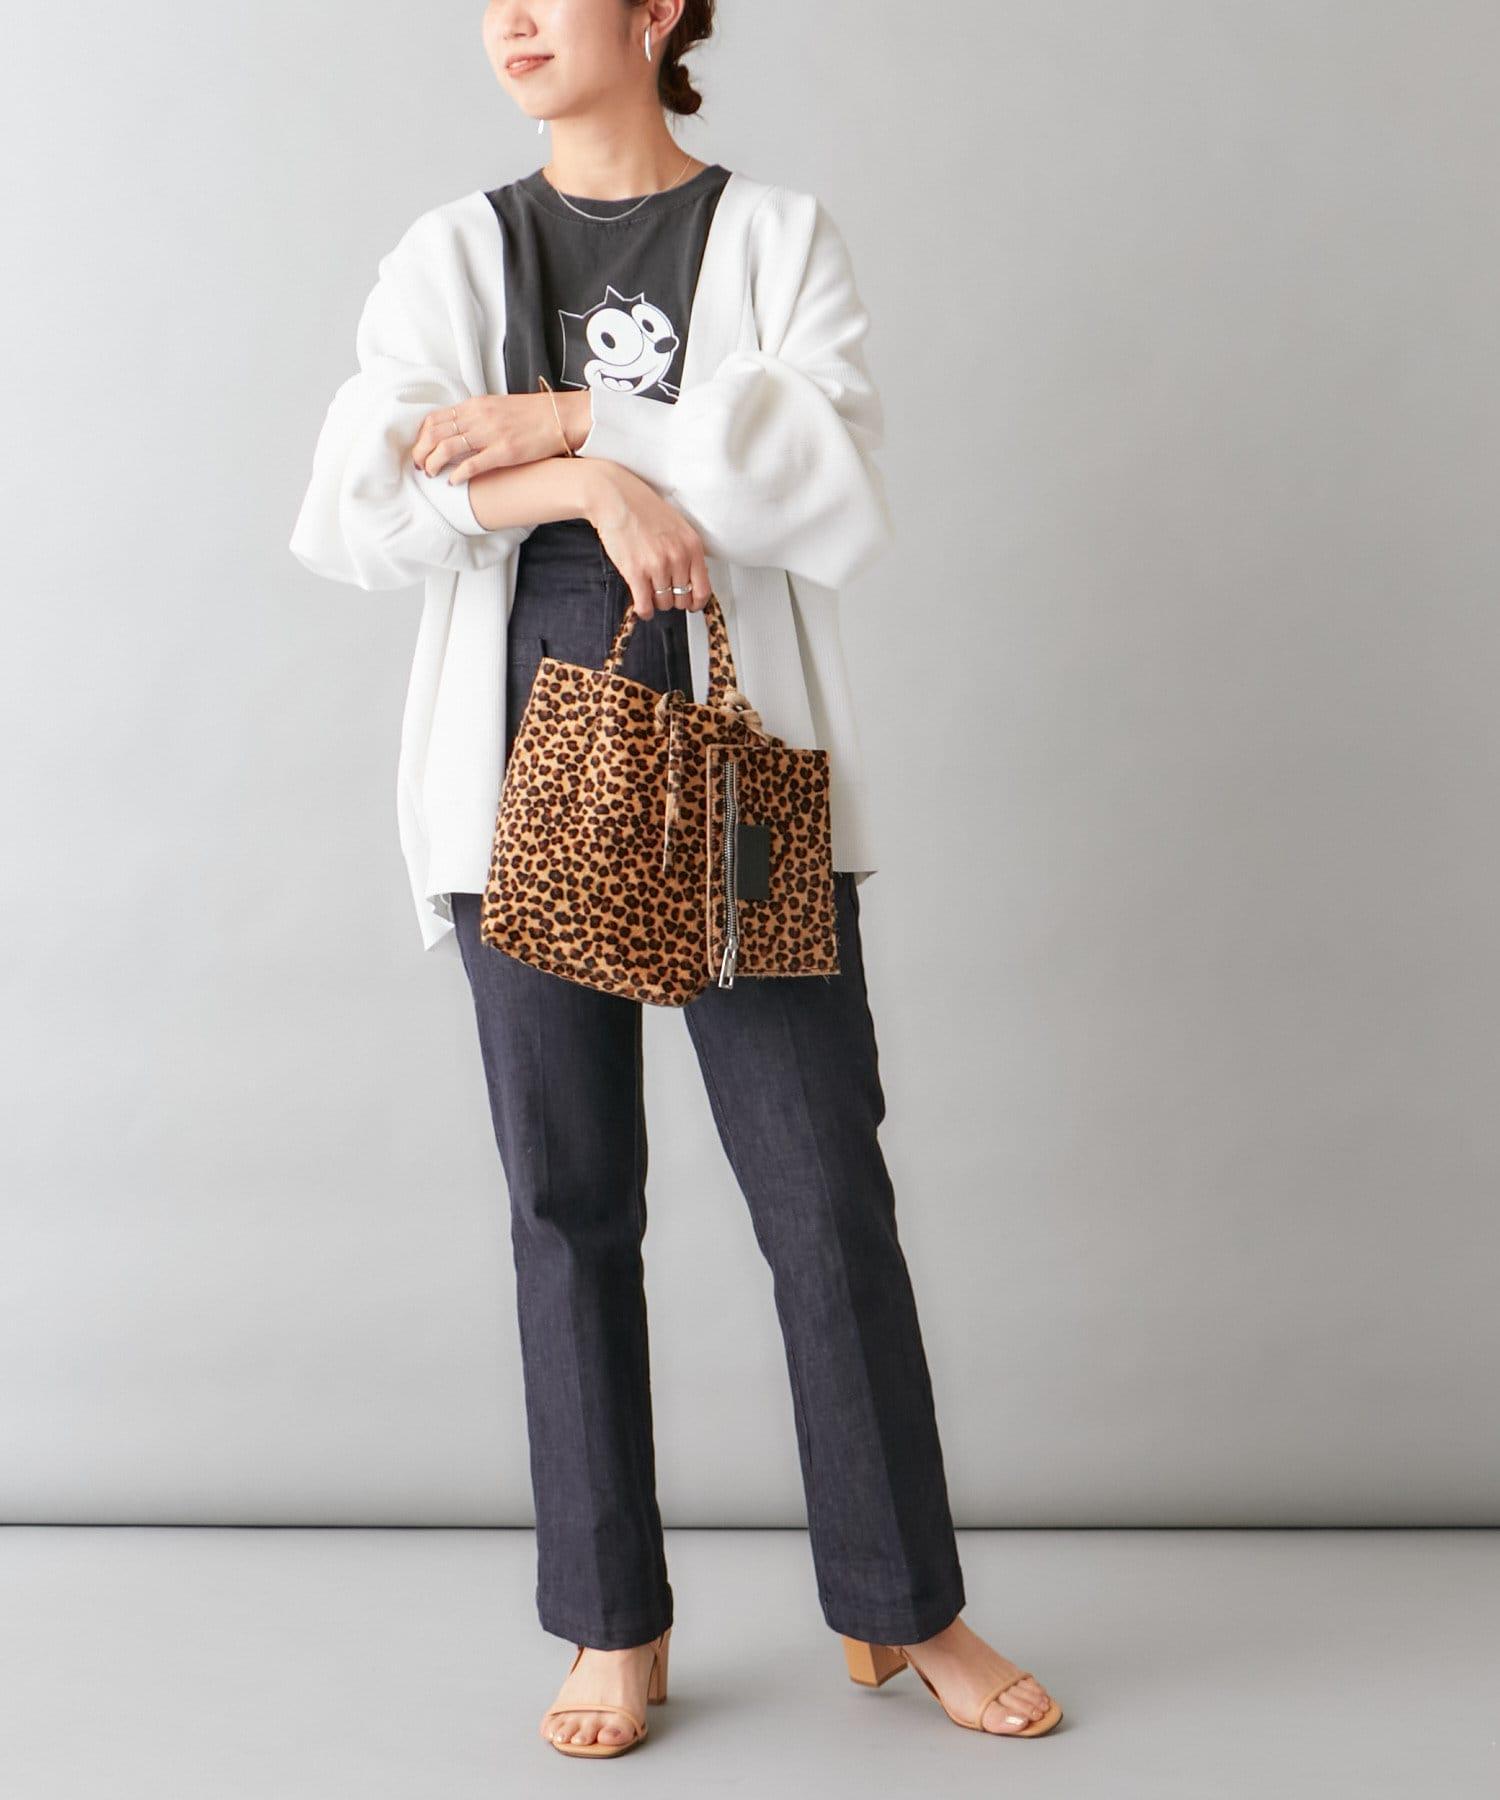 Omekashi(オメカシ) 【WEB限定】Marlon Firenze レオパードミニバッグ